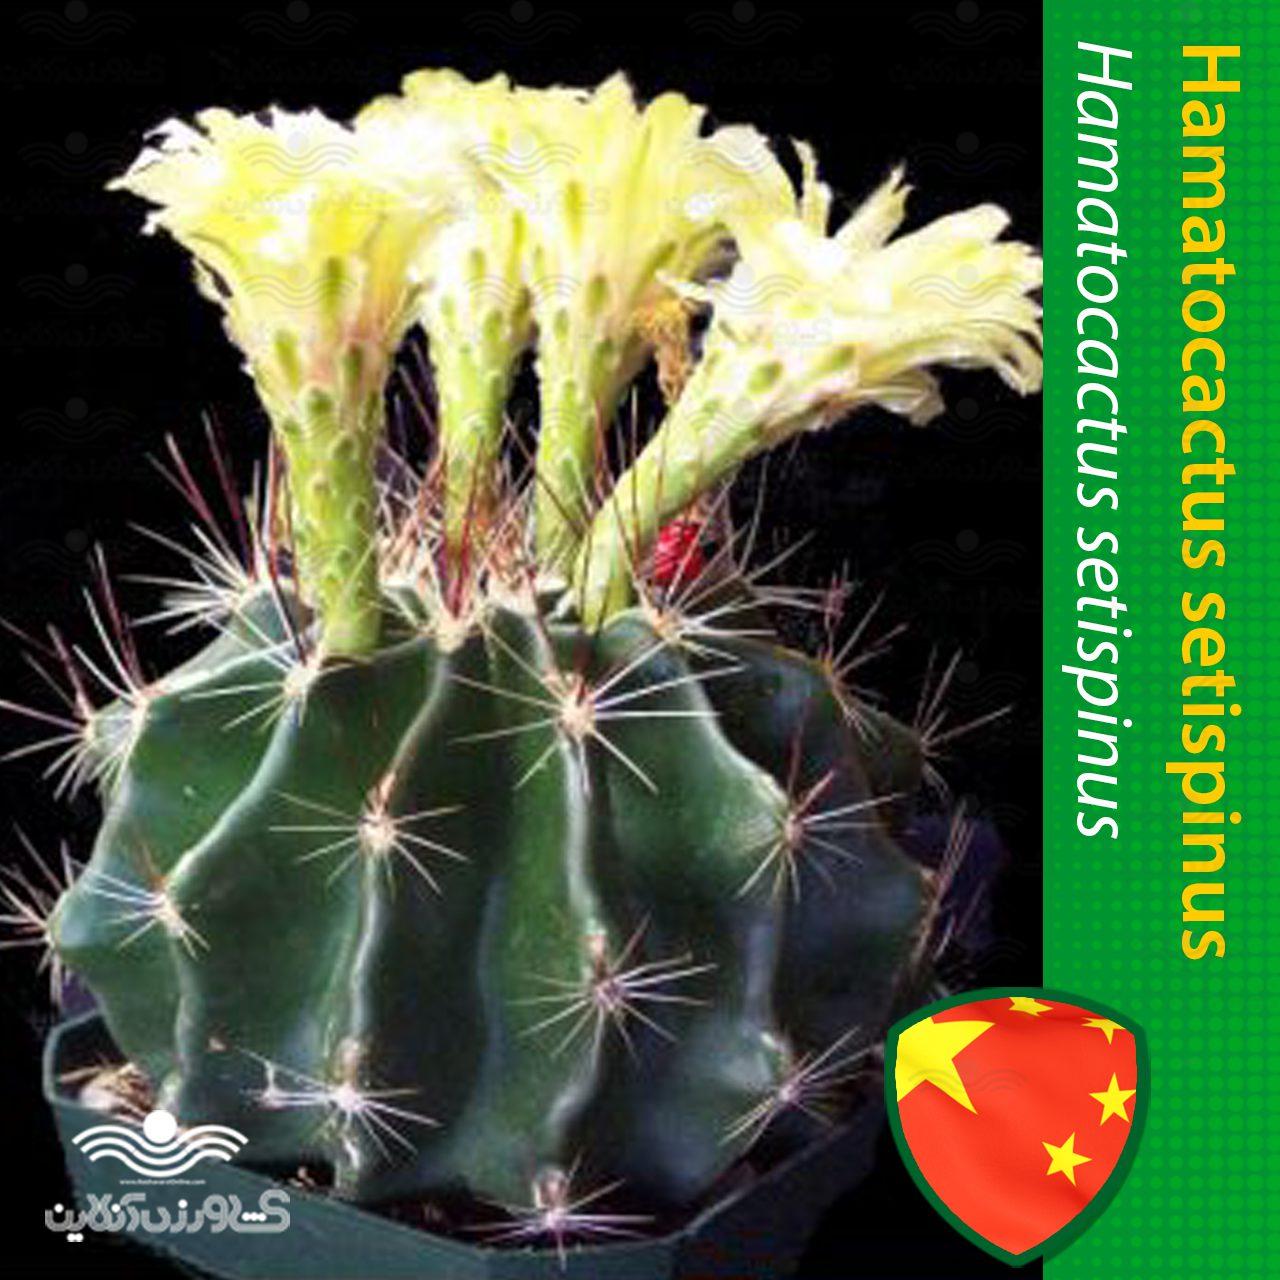 بذر کاکتوس هاماتو